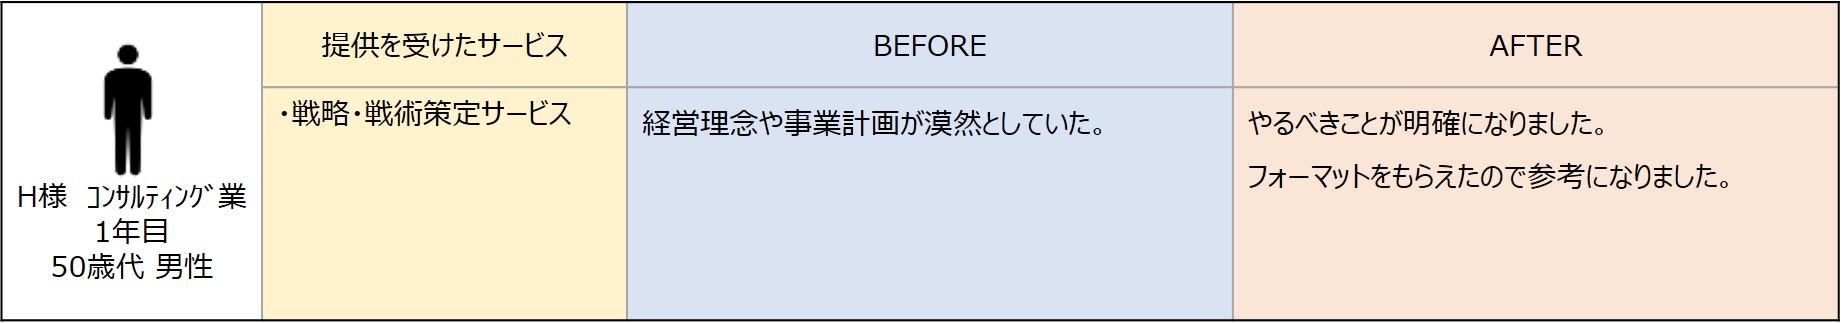 50Mコンサル業_戦略・施術策定サービス